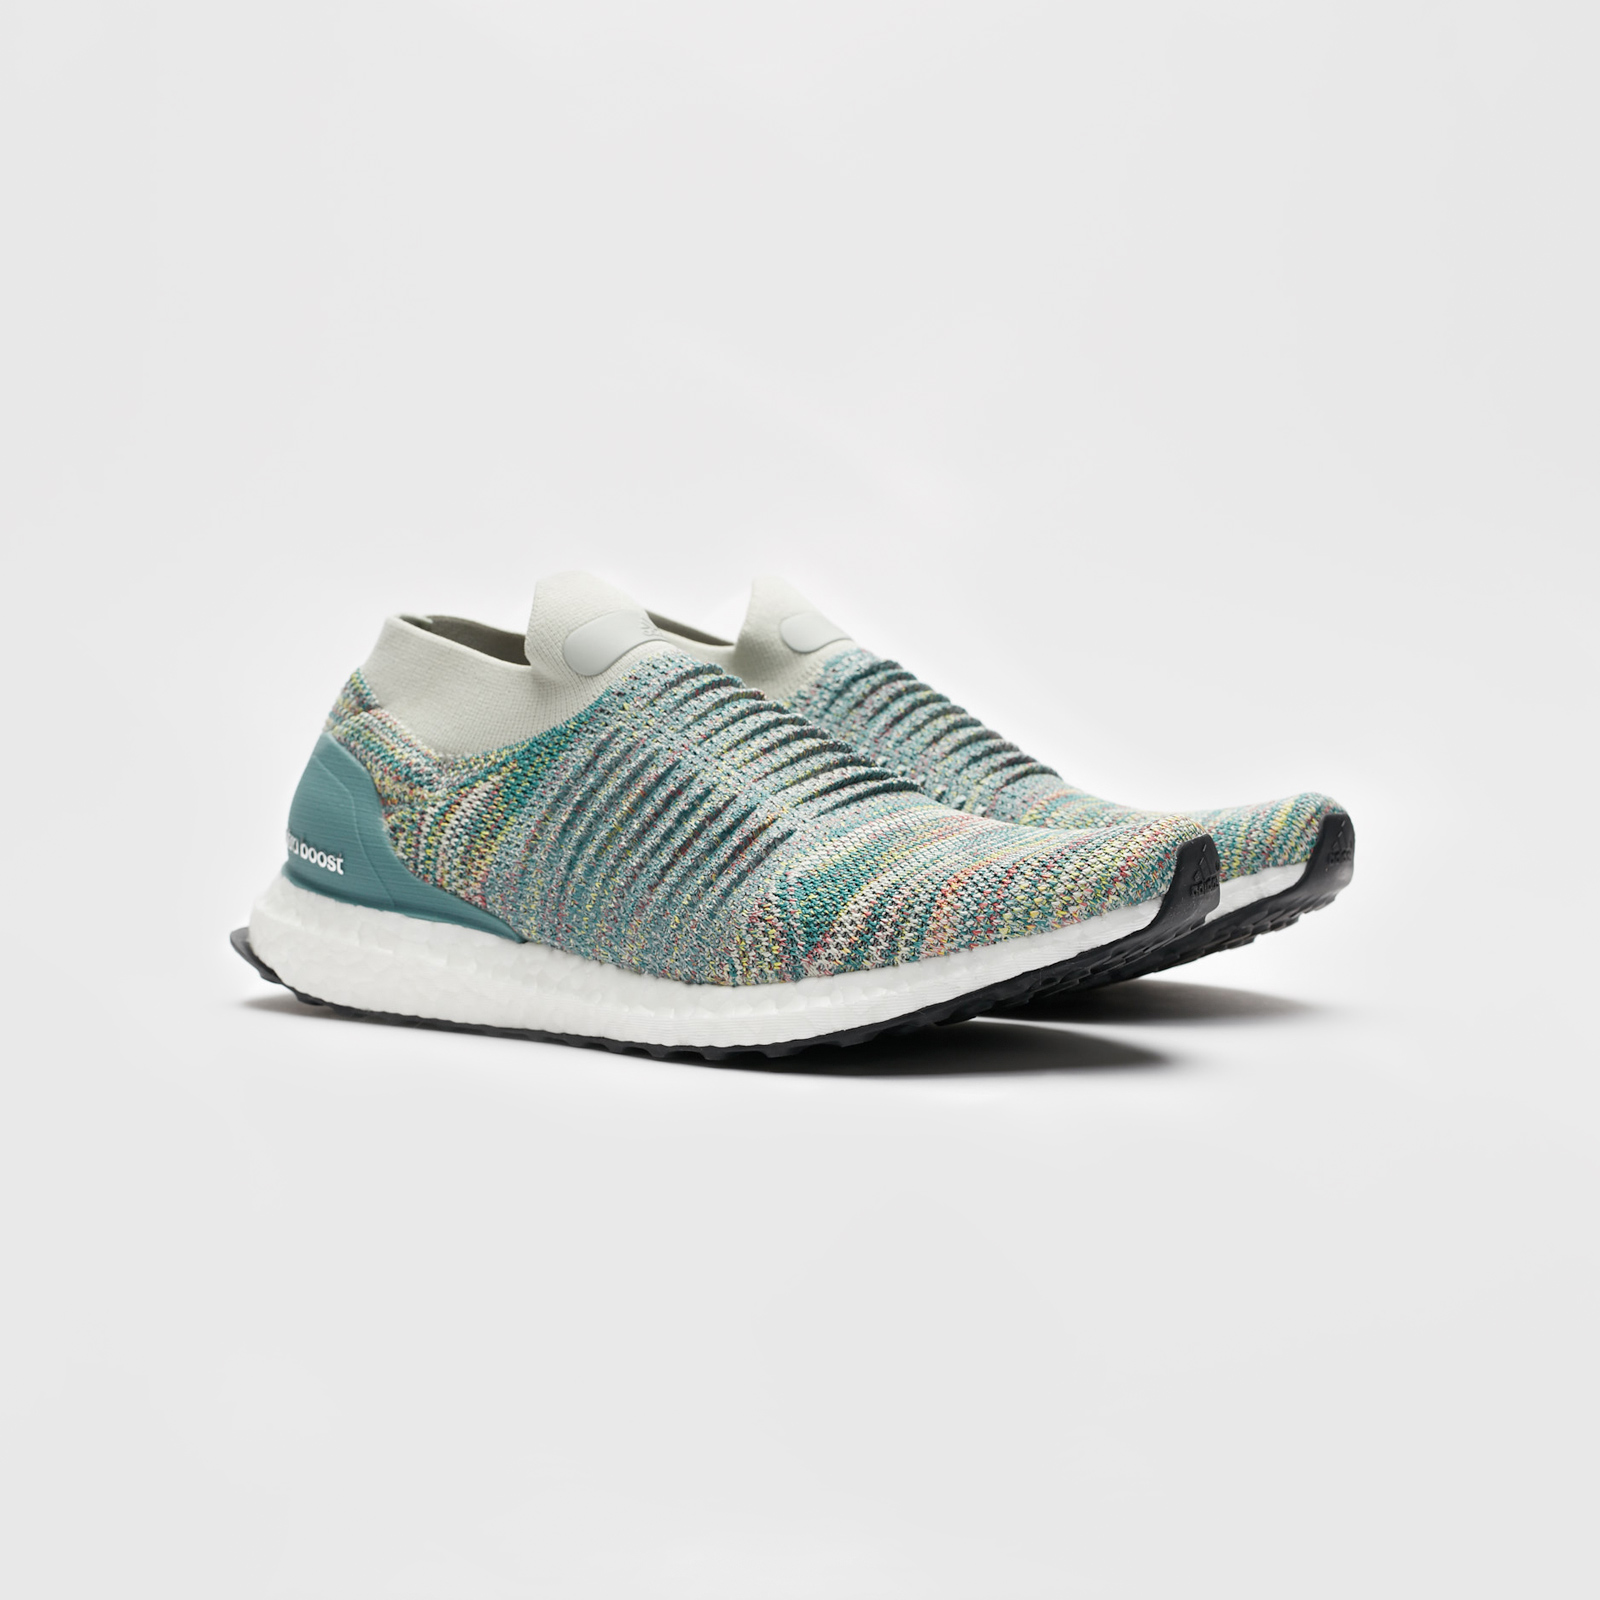 Cm8266 Sneakersnstuff Adidas Sneakers Ultraboost Laceless I 4LqS53cARj